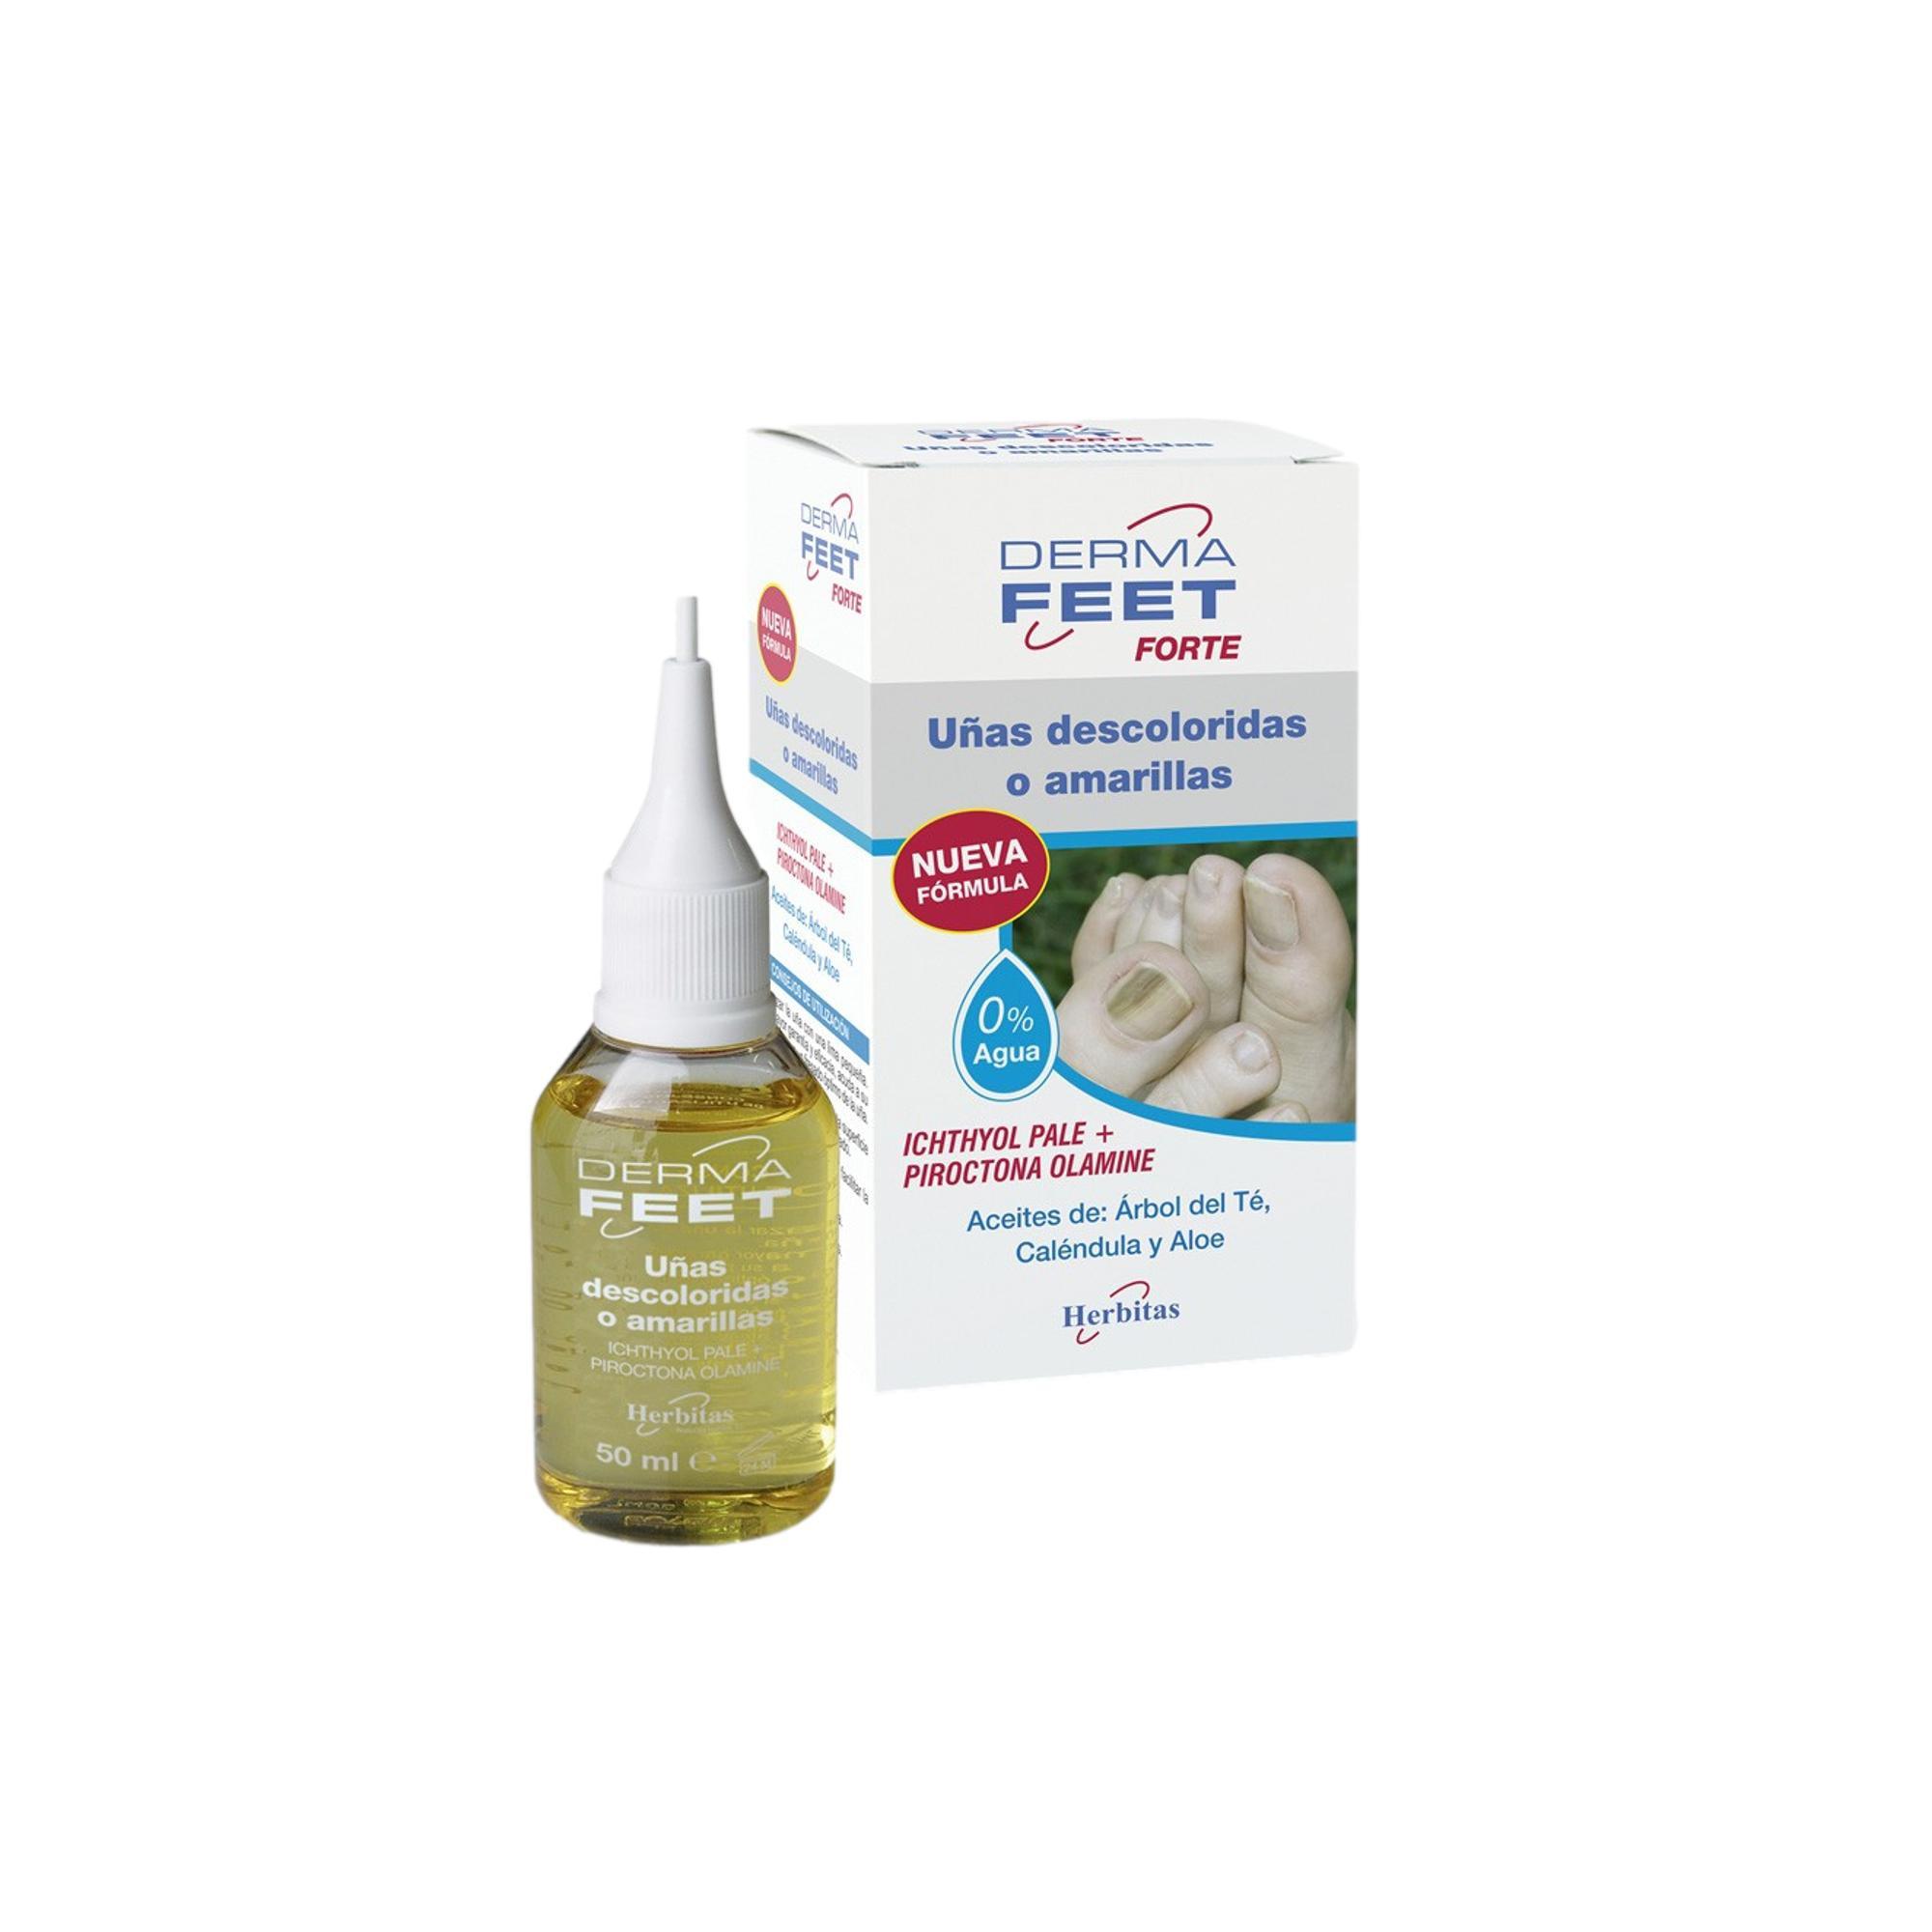 Ongles fanés Dermafeet Forte - 50 ml - Herbitas